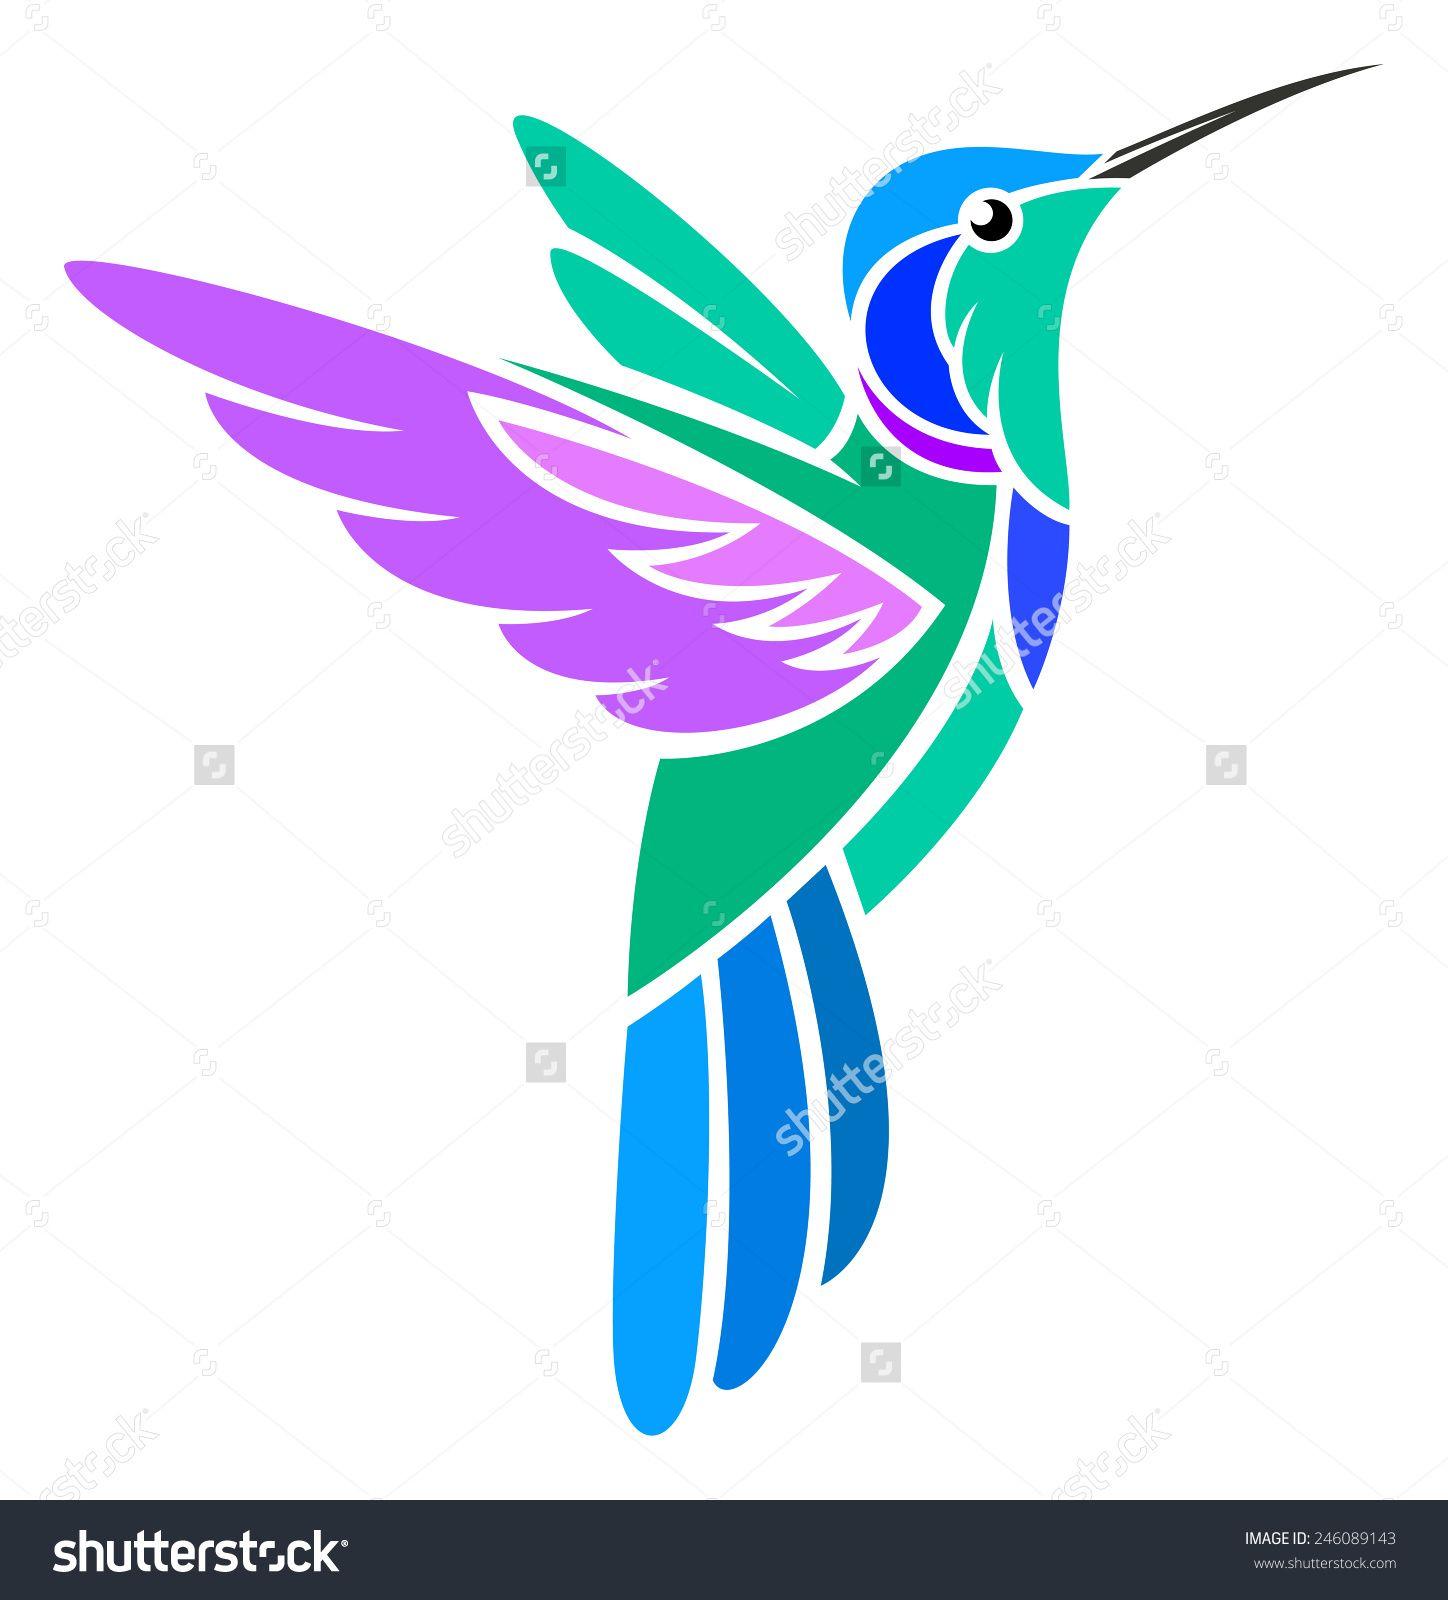 Stylized Hummingbird Green Violetear Ilustracion Vectorial En